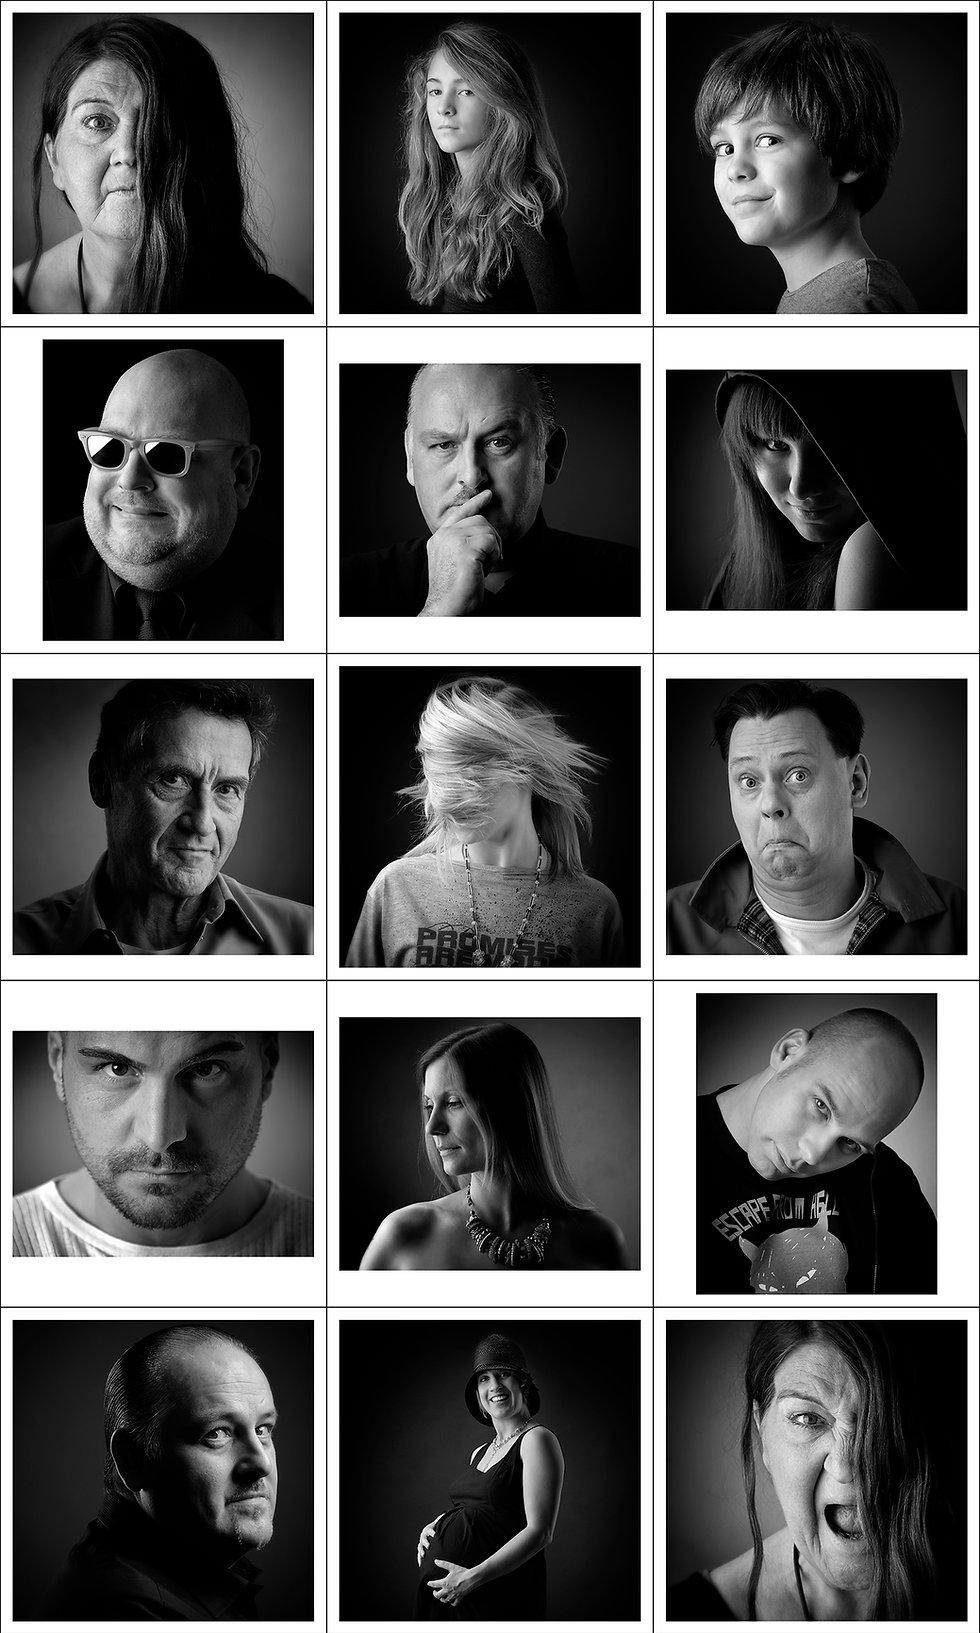 People, black & white, International Photographic Qualifications, Bund professioneller Portraitfotografen, International Photographer of High Quality